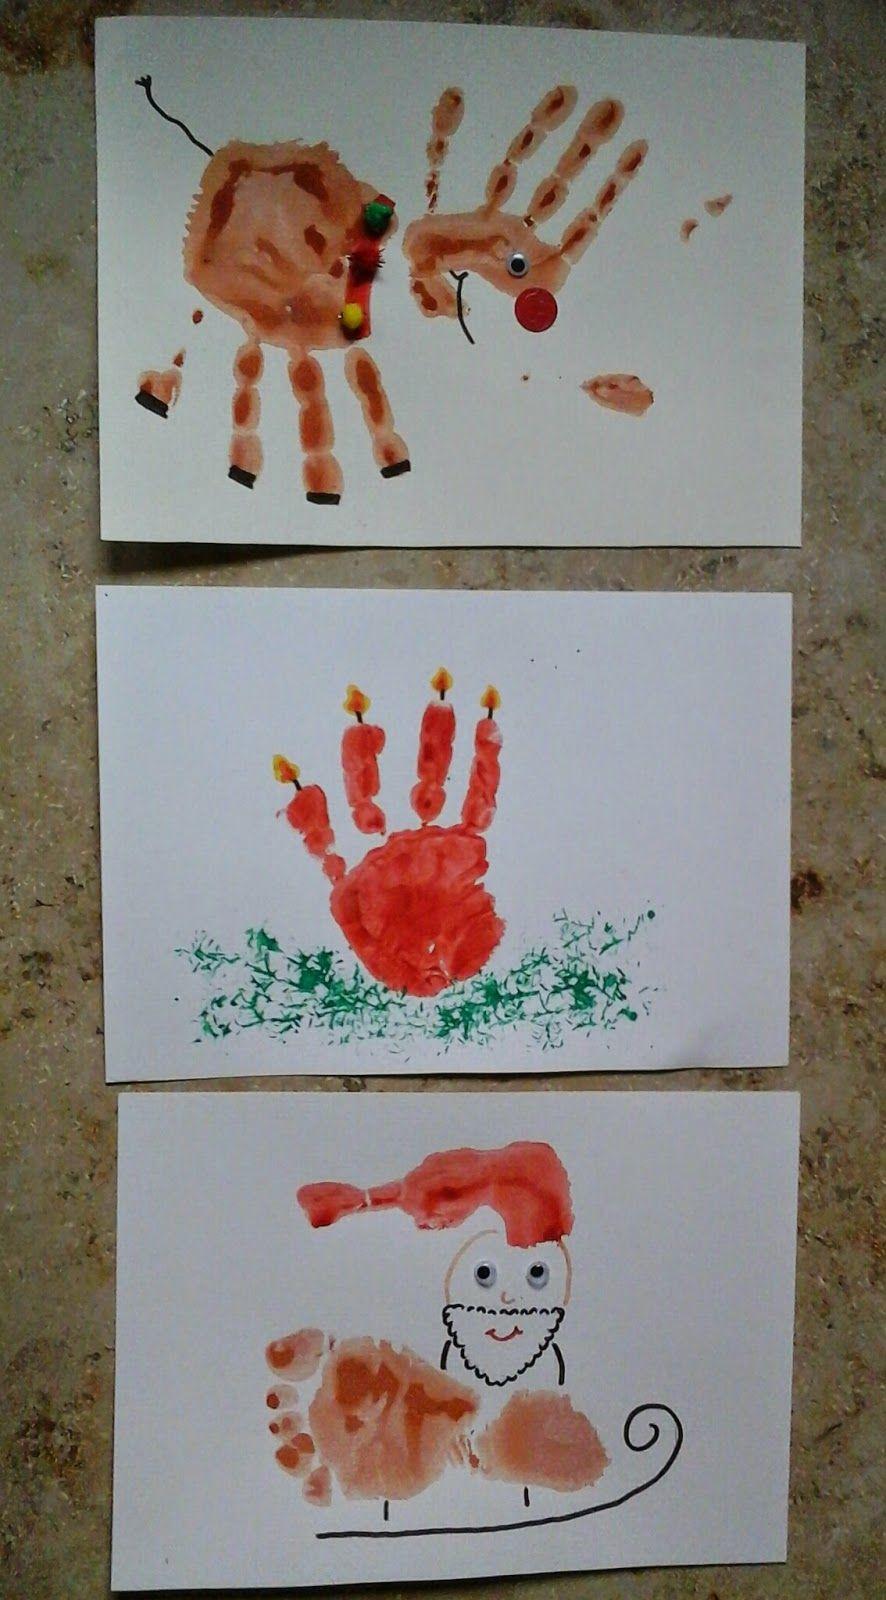 fr he bildung kinderleicht kinder basteln geschenke craft hand and footprint art. Black Bedroom Furniture Sets. Home Design Ideas